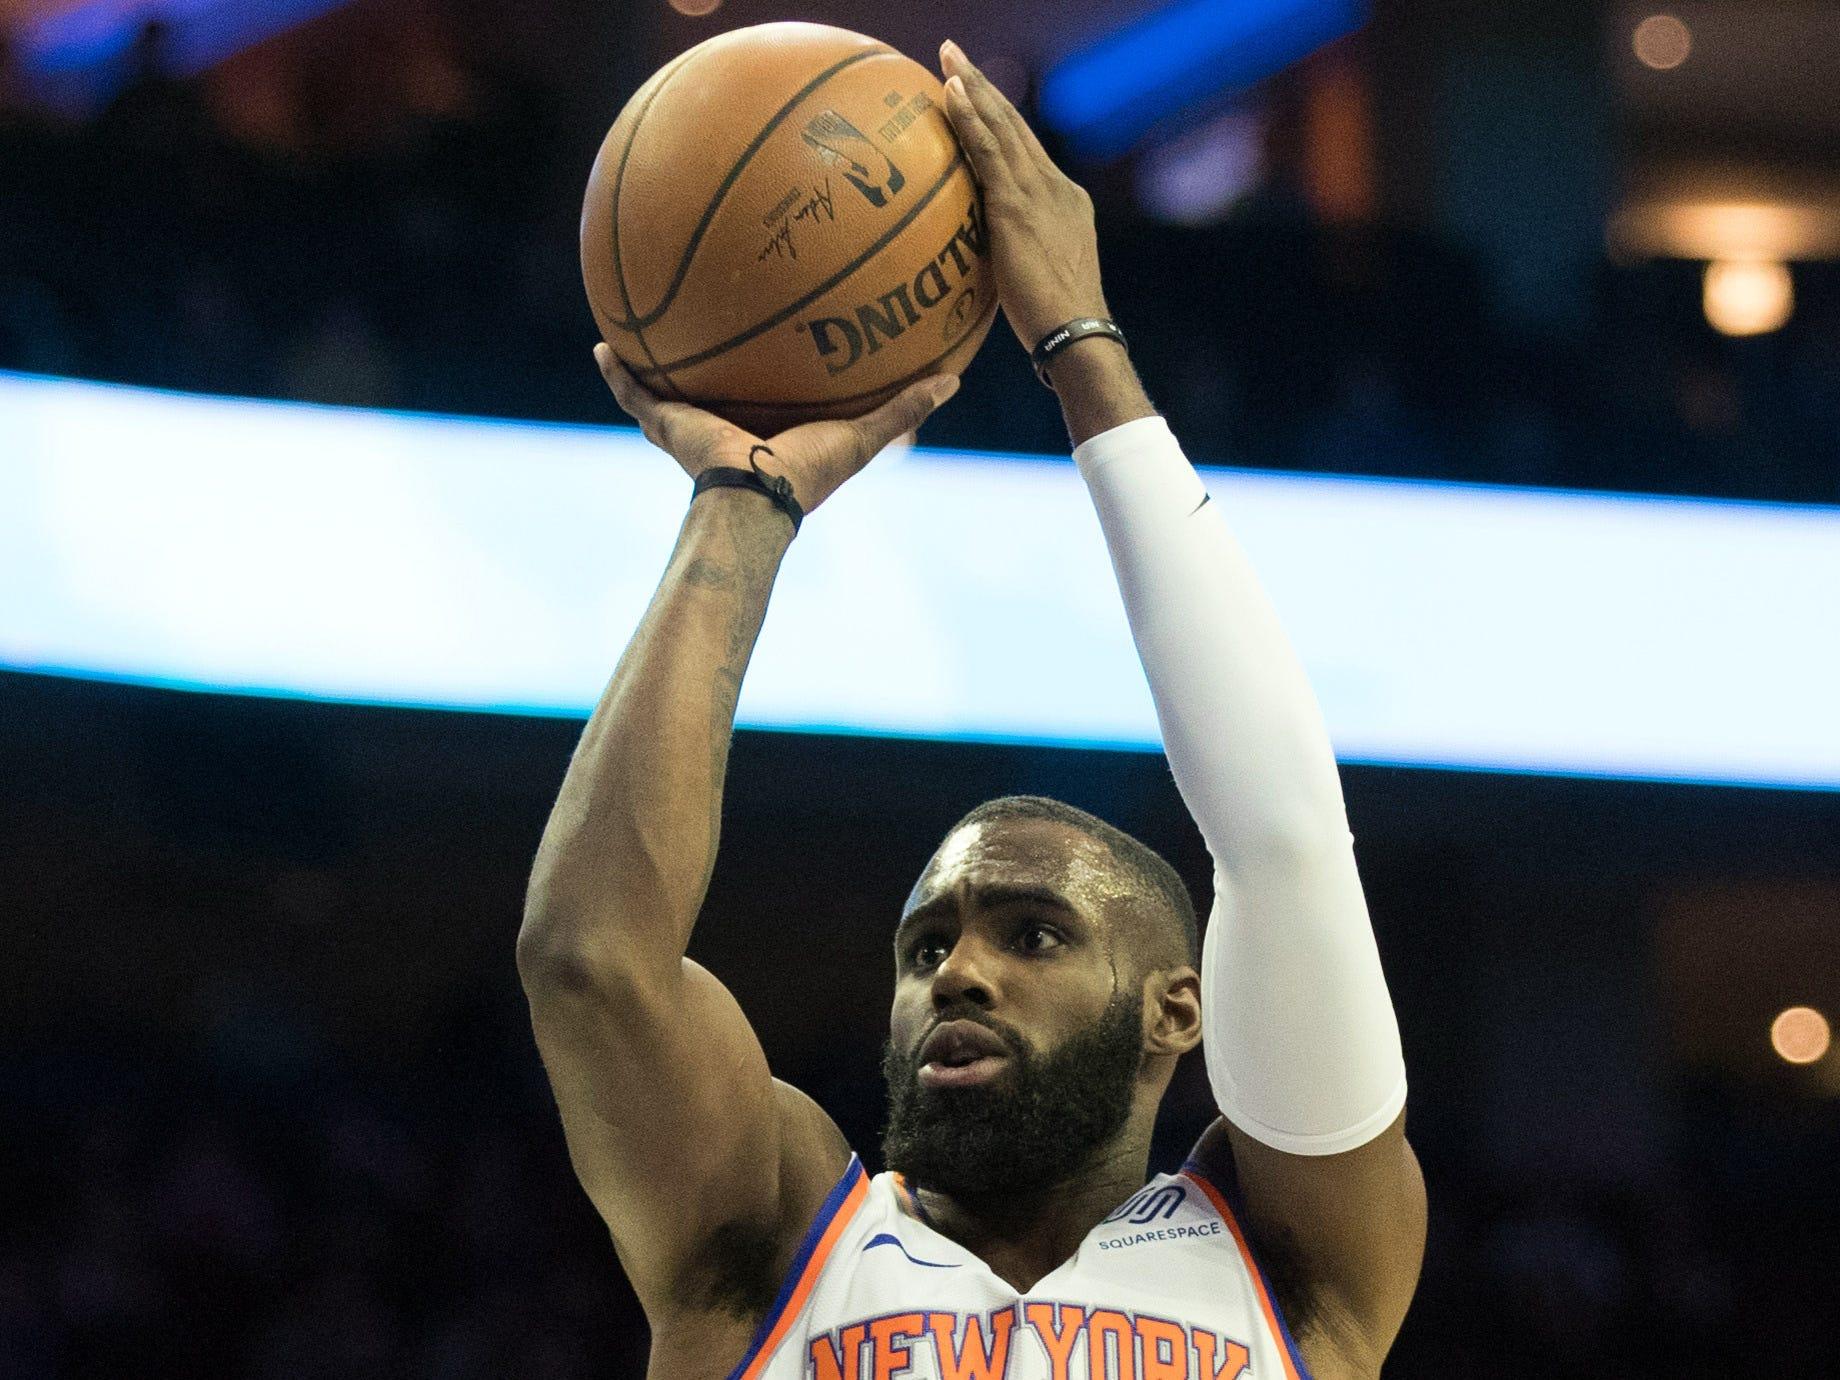 Dec 19, 2018; Philadelphia, PA, USA; New York Knicks guard Tim Hardaway Jr. (3) shoots against the Philadelphia 76ers during the first quarter at Wells Fargo Center.